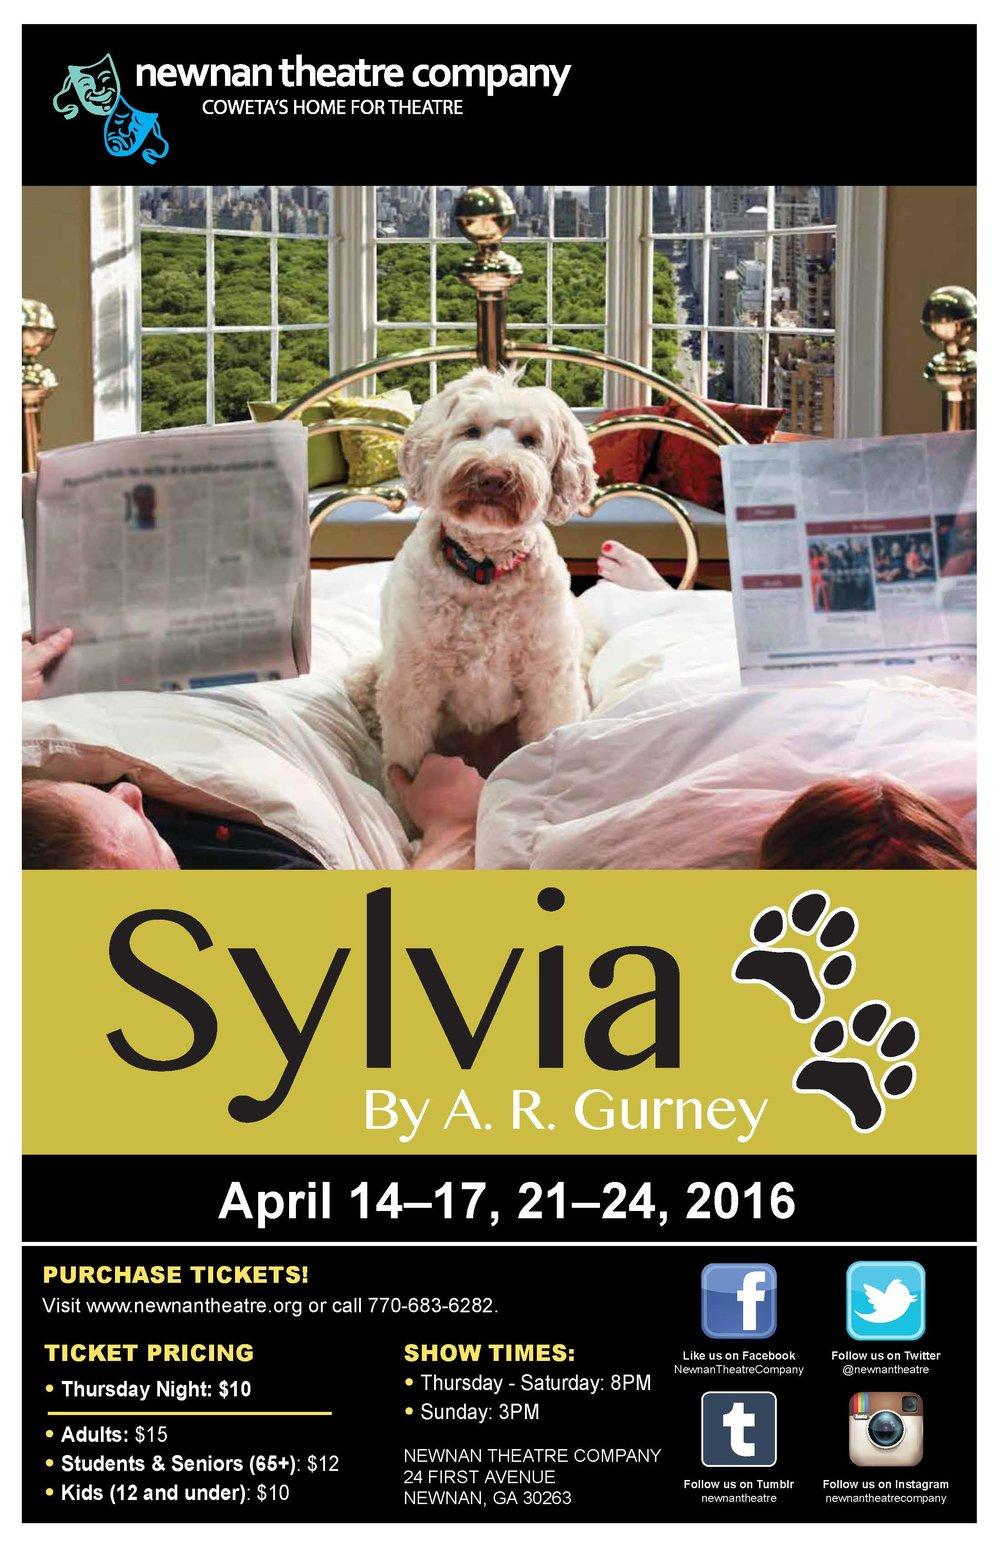 Sylvia_11x17 poster.jpg